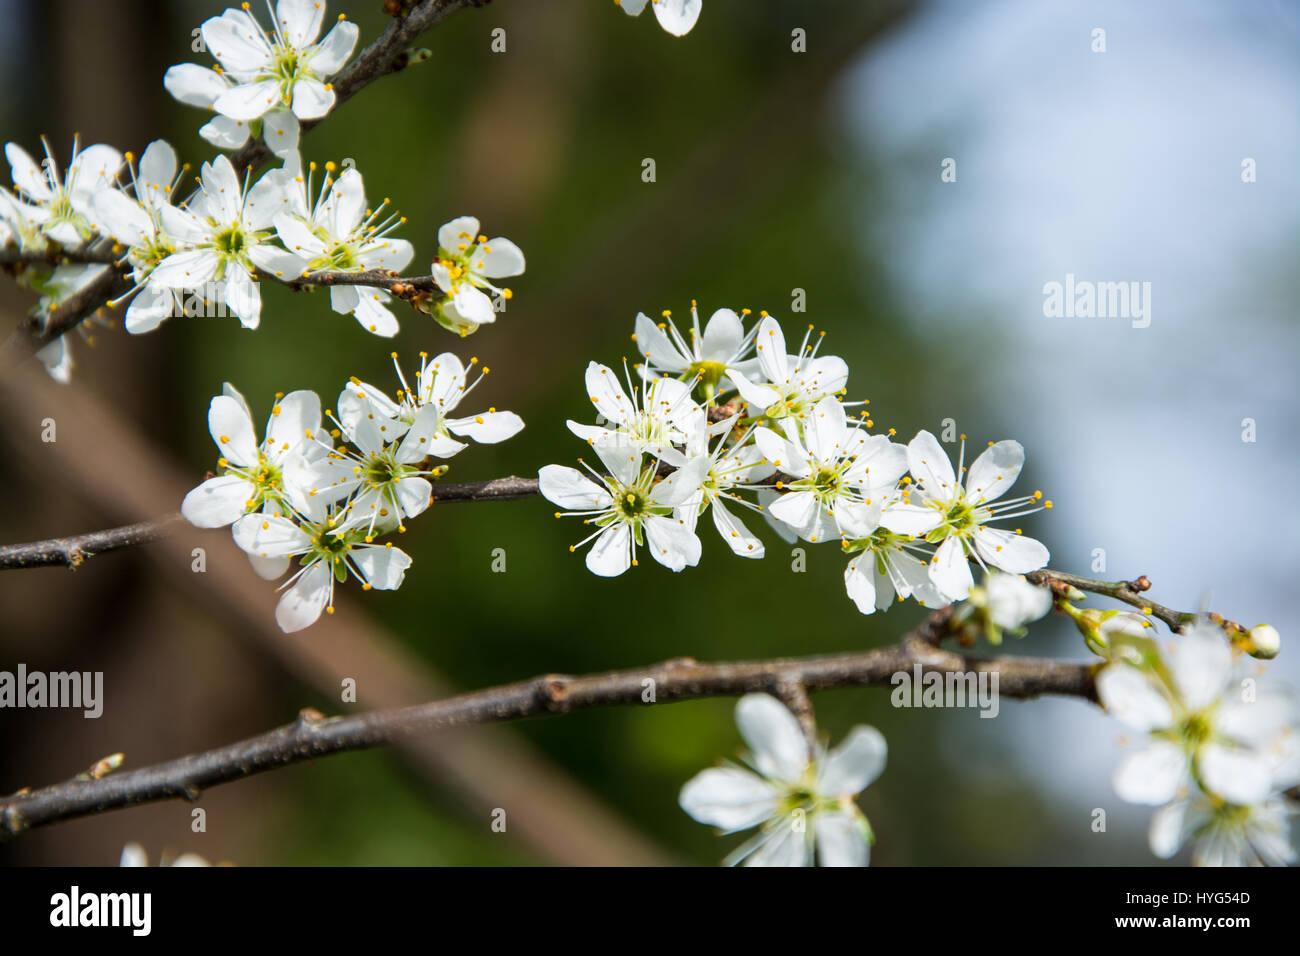 Clouseup Of White Plum Flower Spring Blossom Stock Photo 137423565